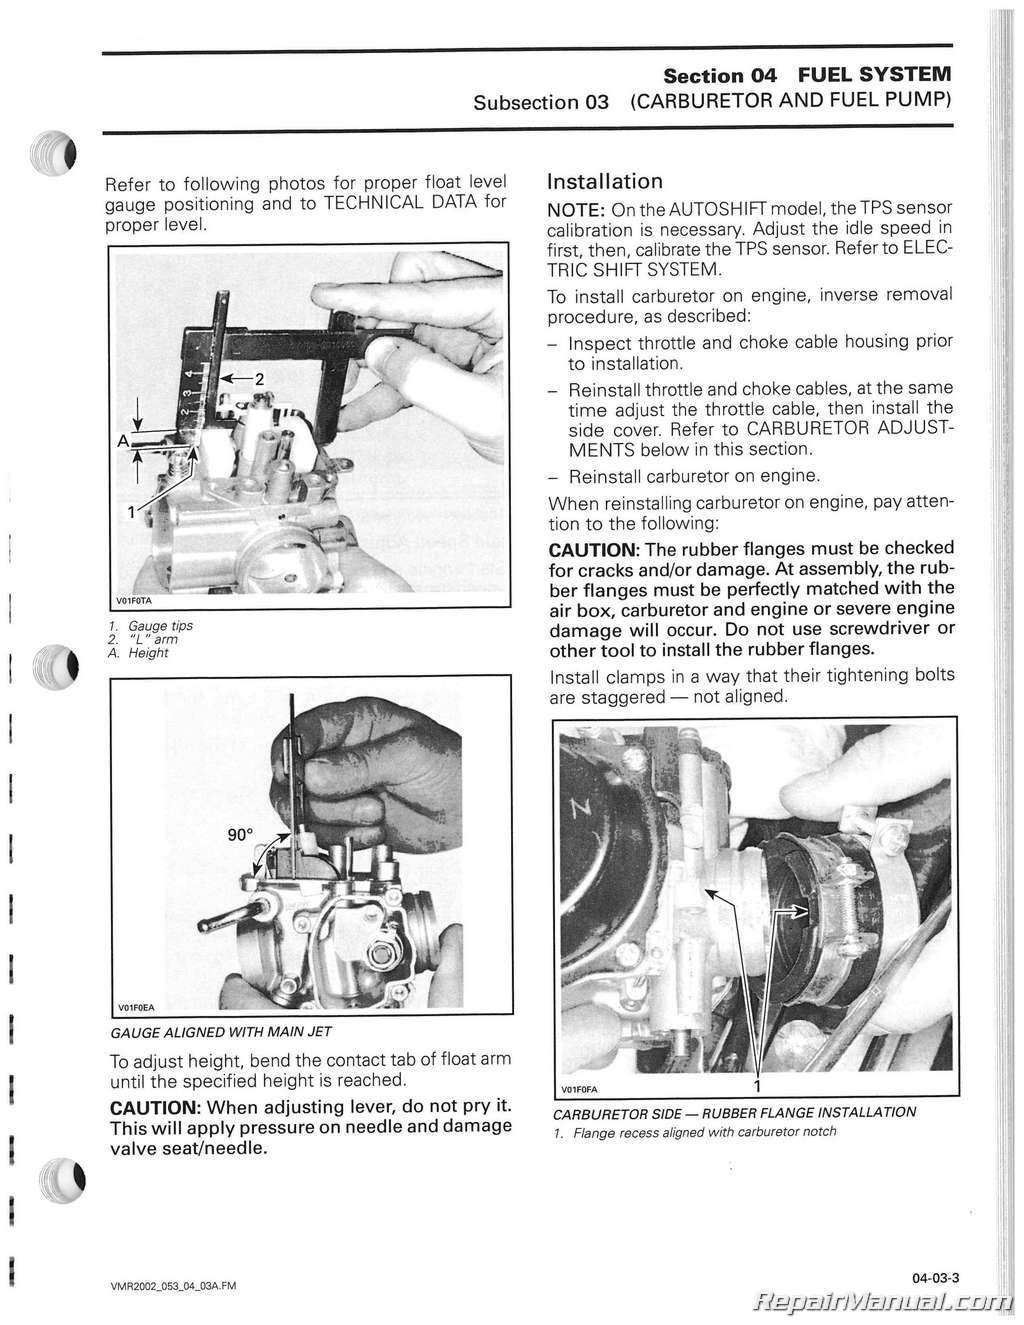 Bombardier j5 service Manual